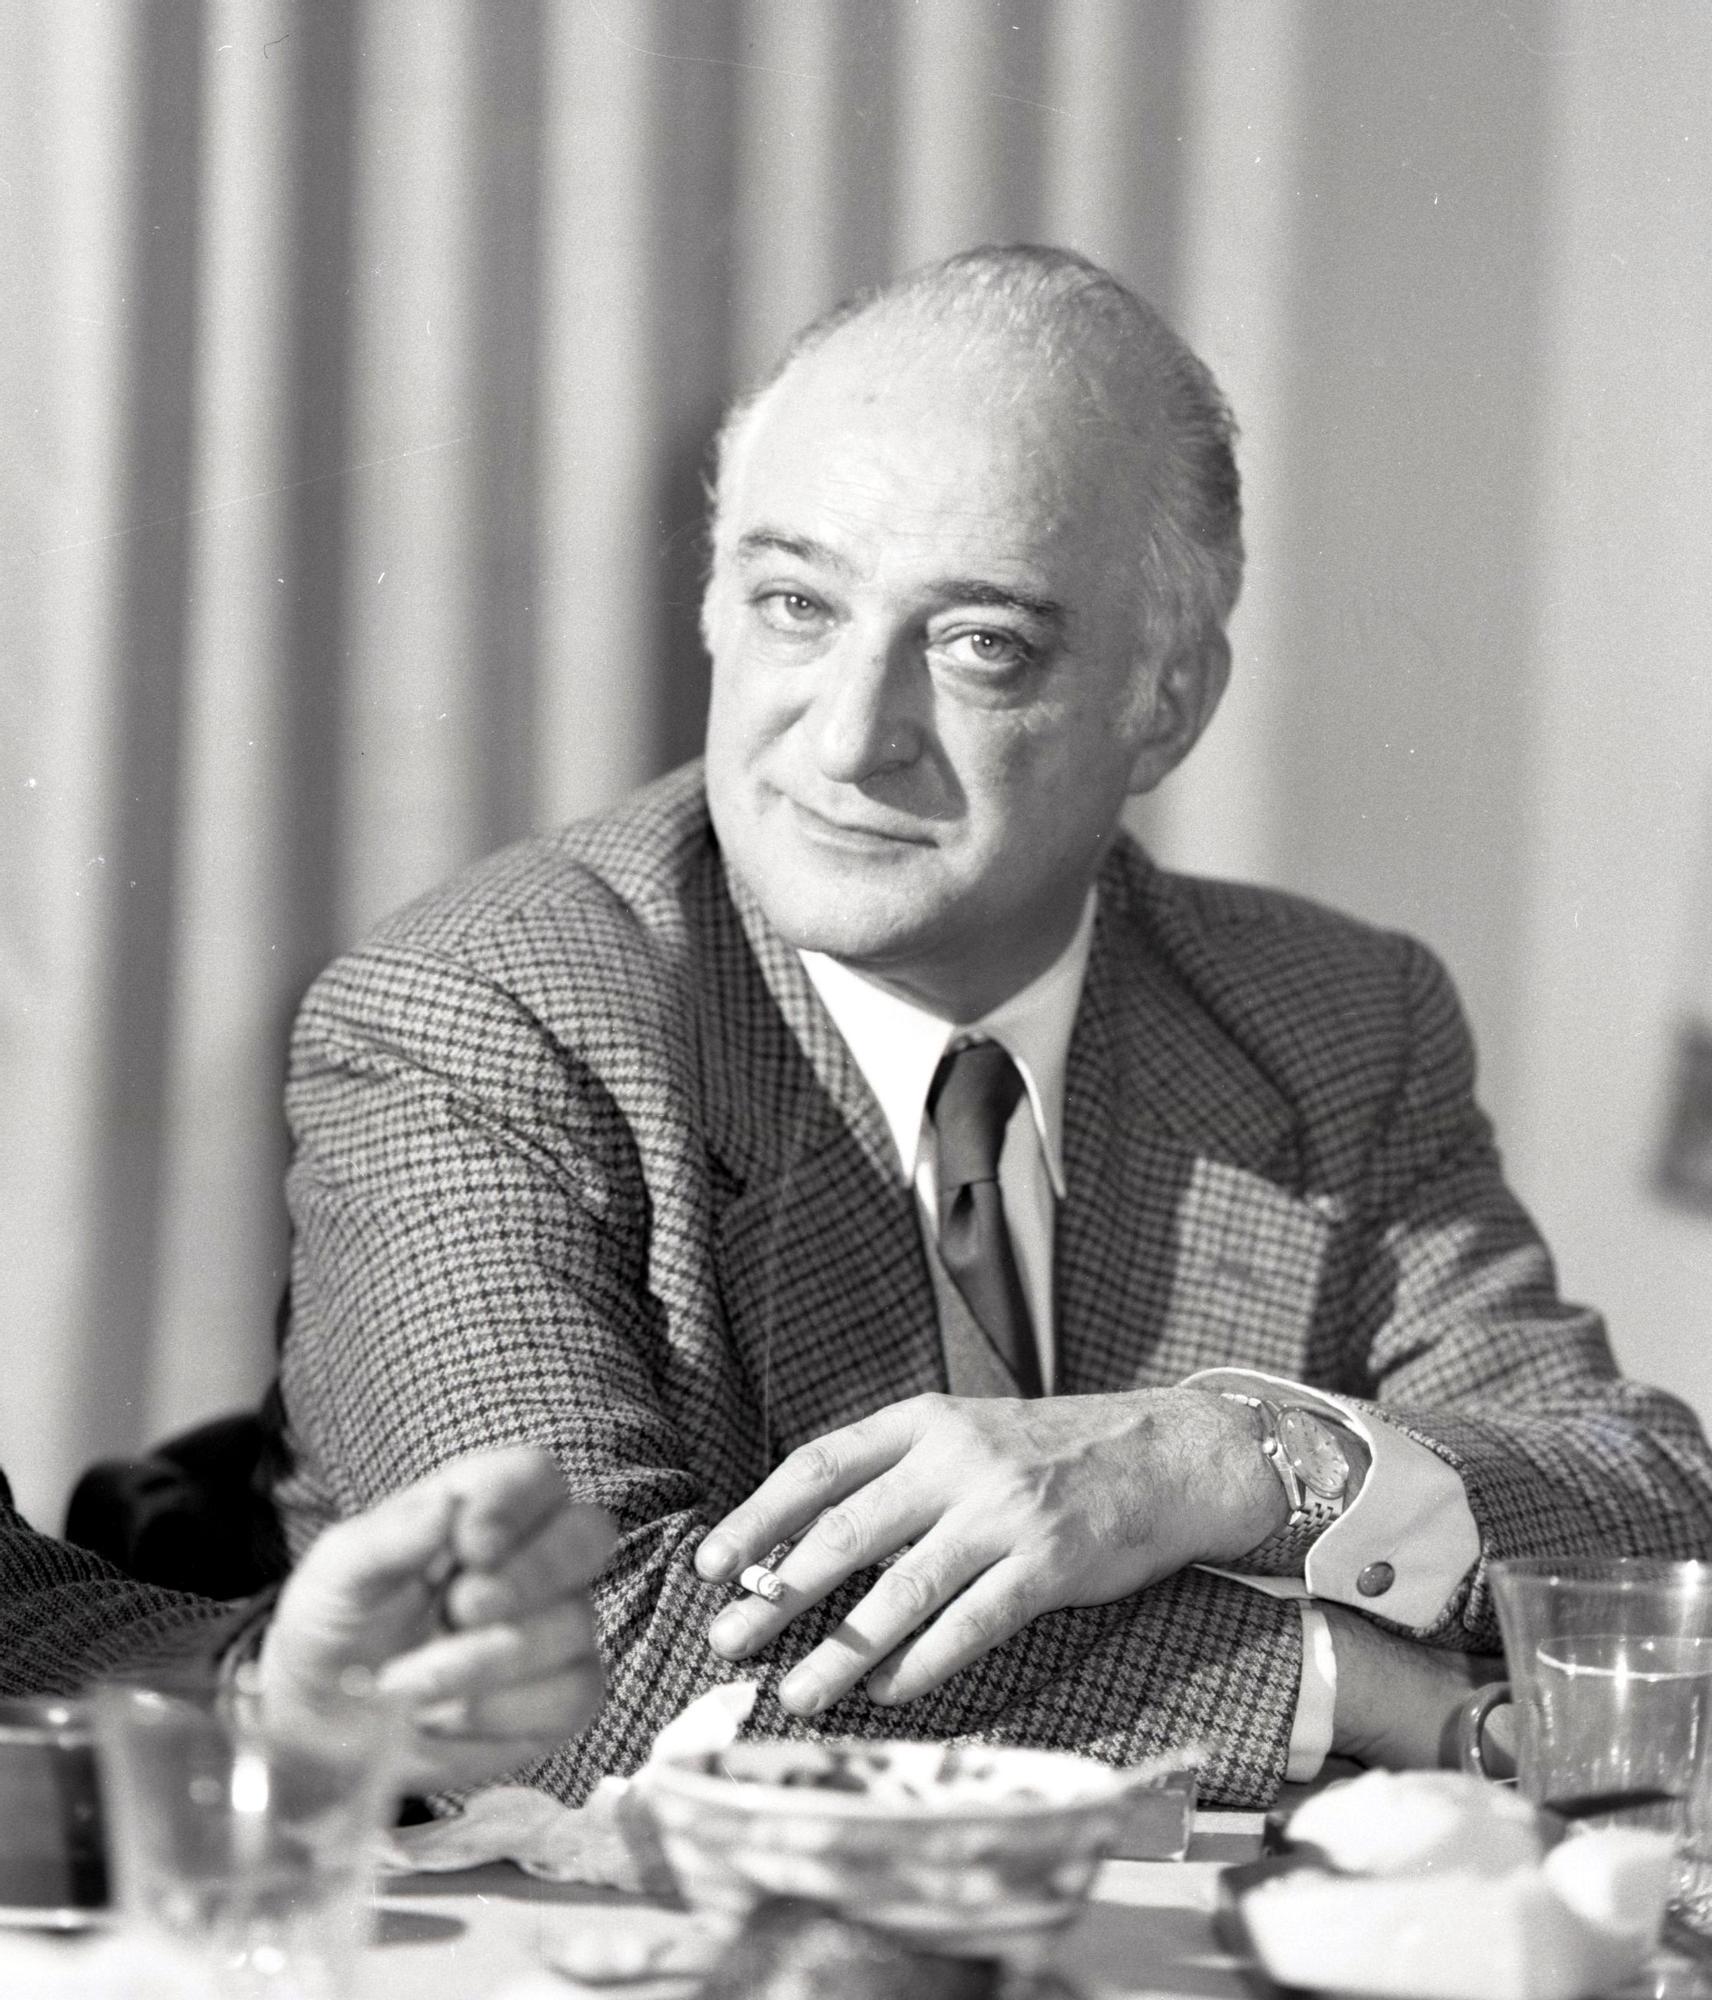 Francisco Vizoso, catedr�tico de Lat�n en el Instituto Jovellanos, h. 1970.jpg